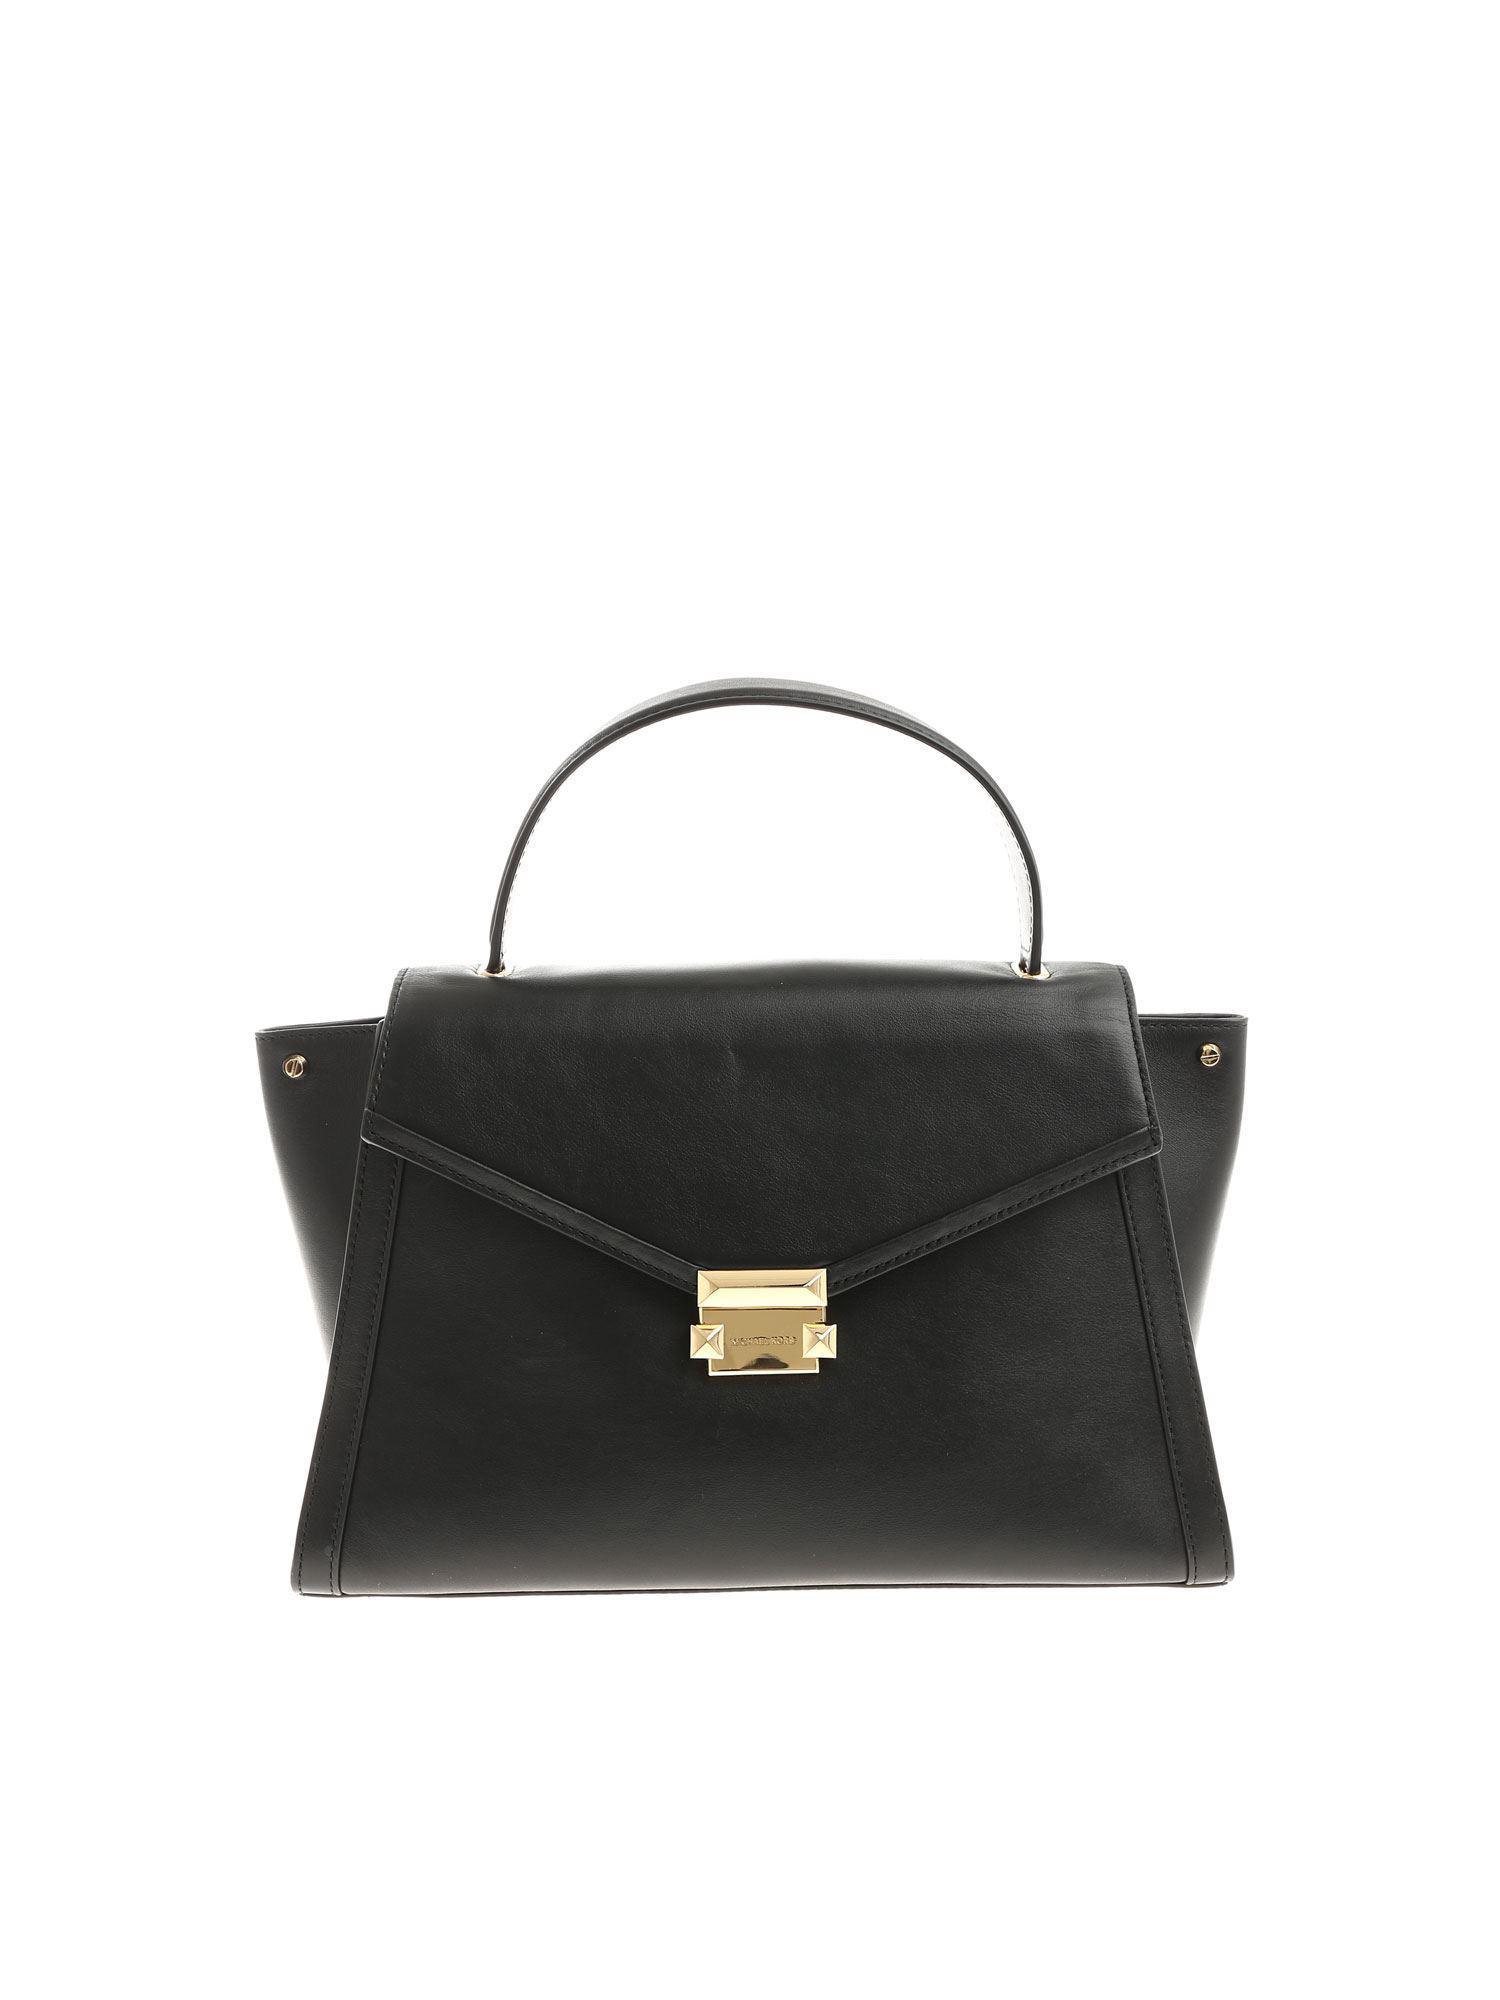 5d2ff2b39ca2 Lyst - Michael Kors Black Whitney Handbag in Black